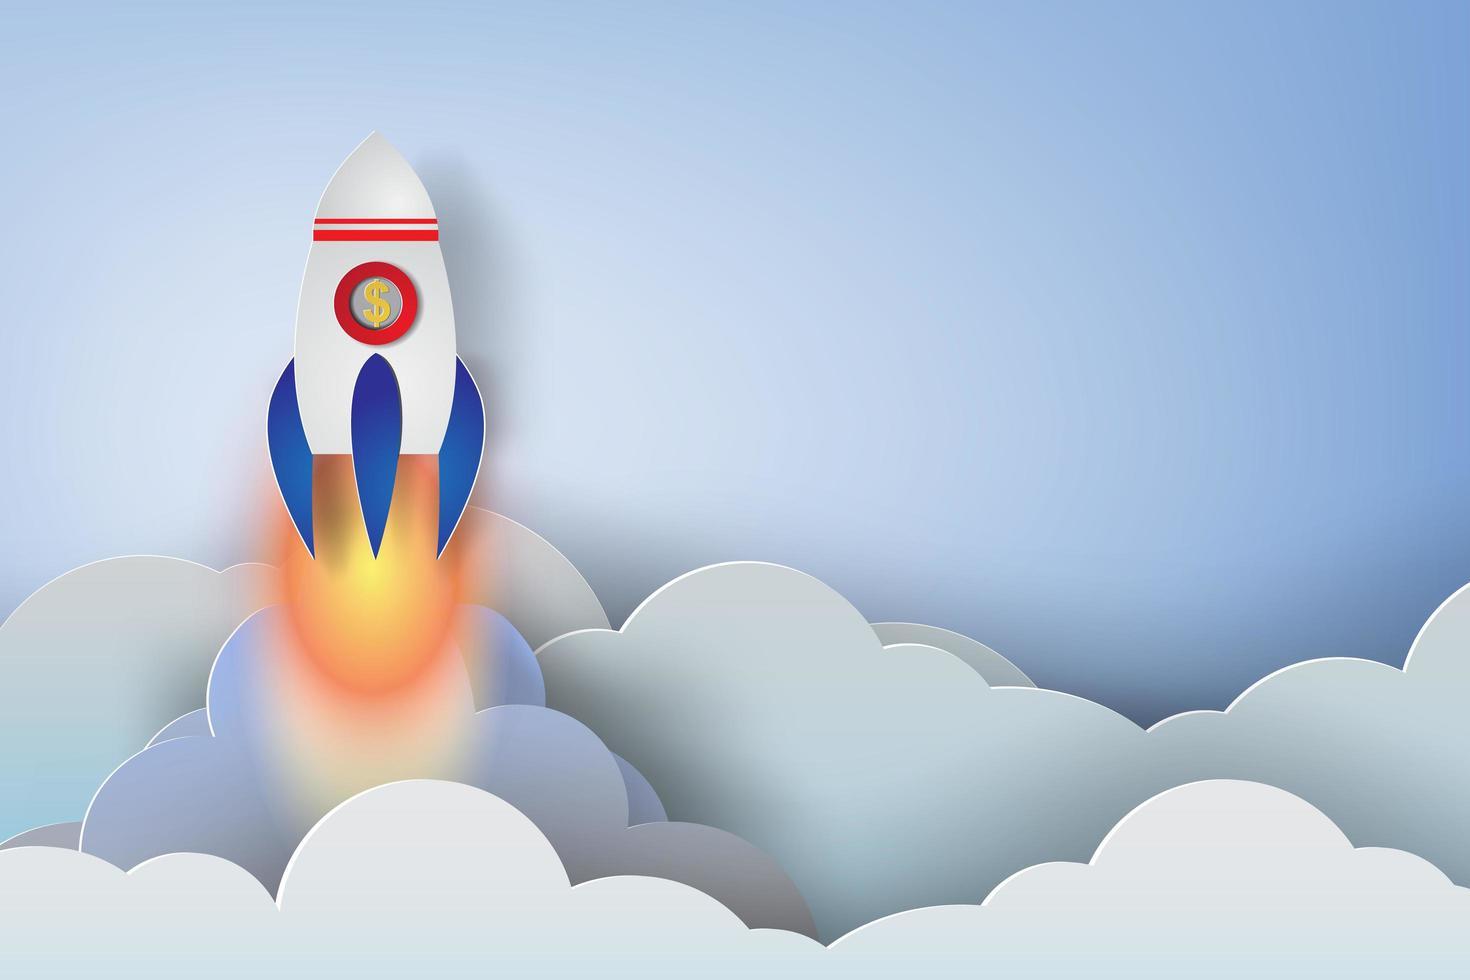 Paper Art Rocket Launching Up Through Clouds  vector